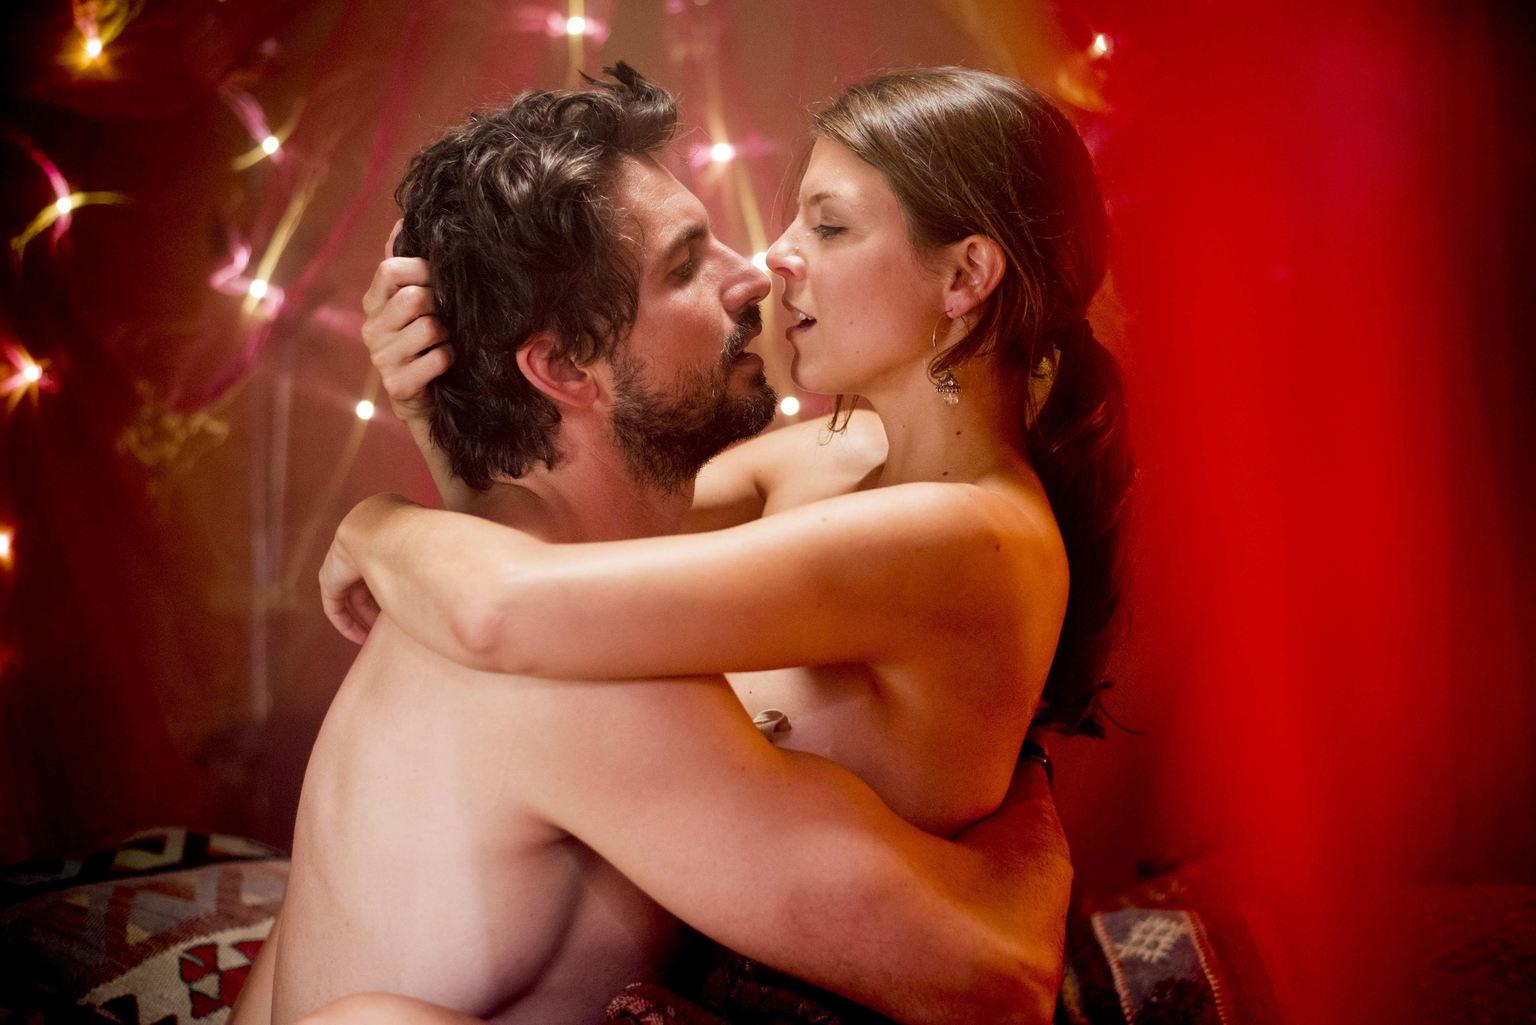 Porno Porno izle Erotik Seks Filmleri Sex izle HD Sikiş